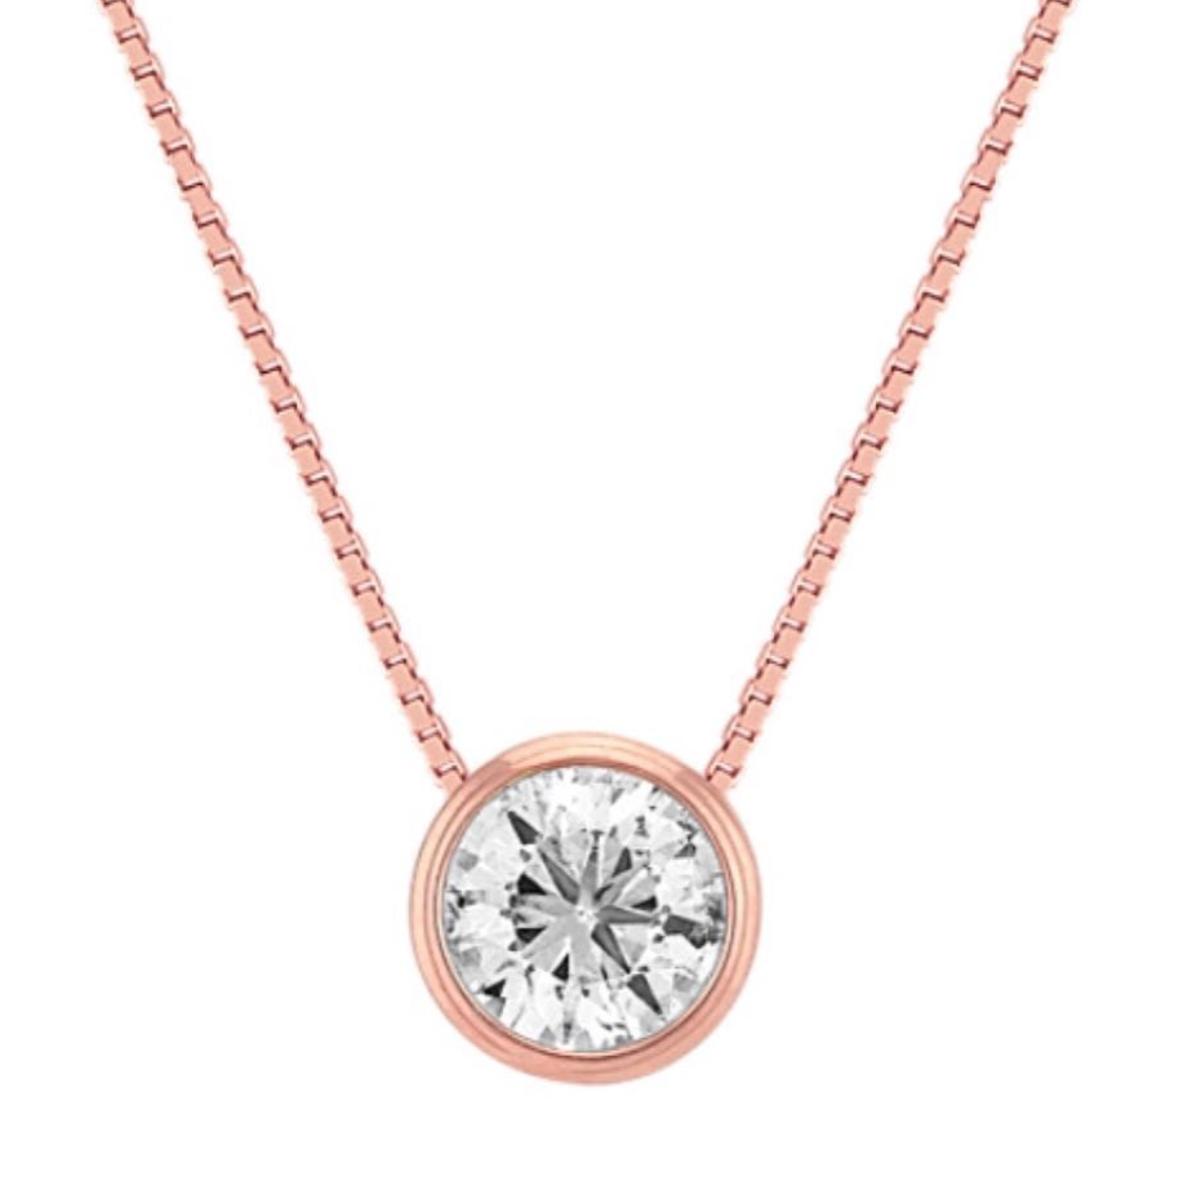 Klein 39 s jewelry in houston tx 77057 for Jewelry stores westheimer houston tx